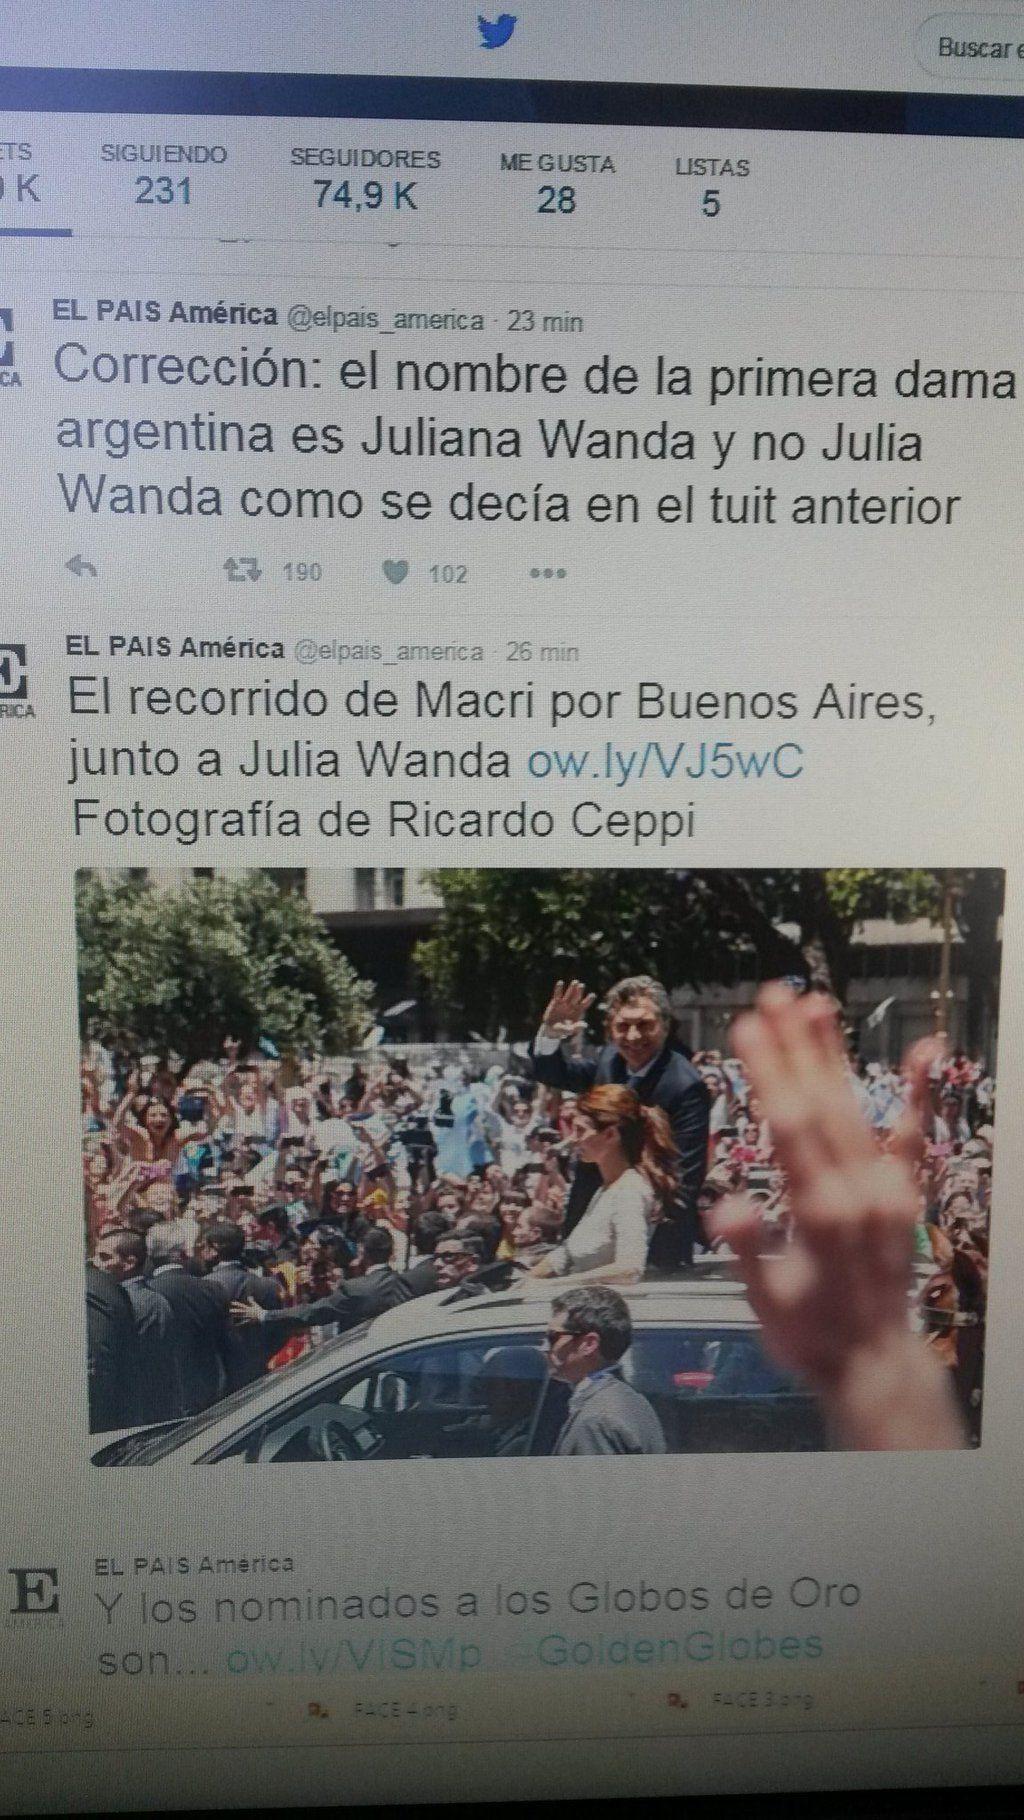 "Sebastián Volterri on Twitter: ""Mientras tanto... en El País, de España... https://t.co/QIj0Ta0kzC"""